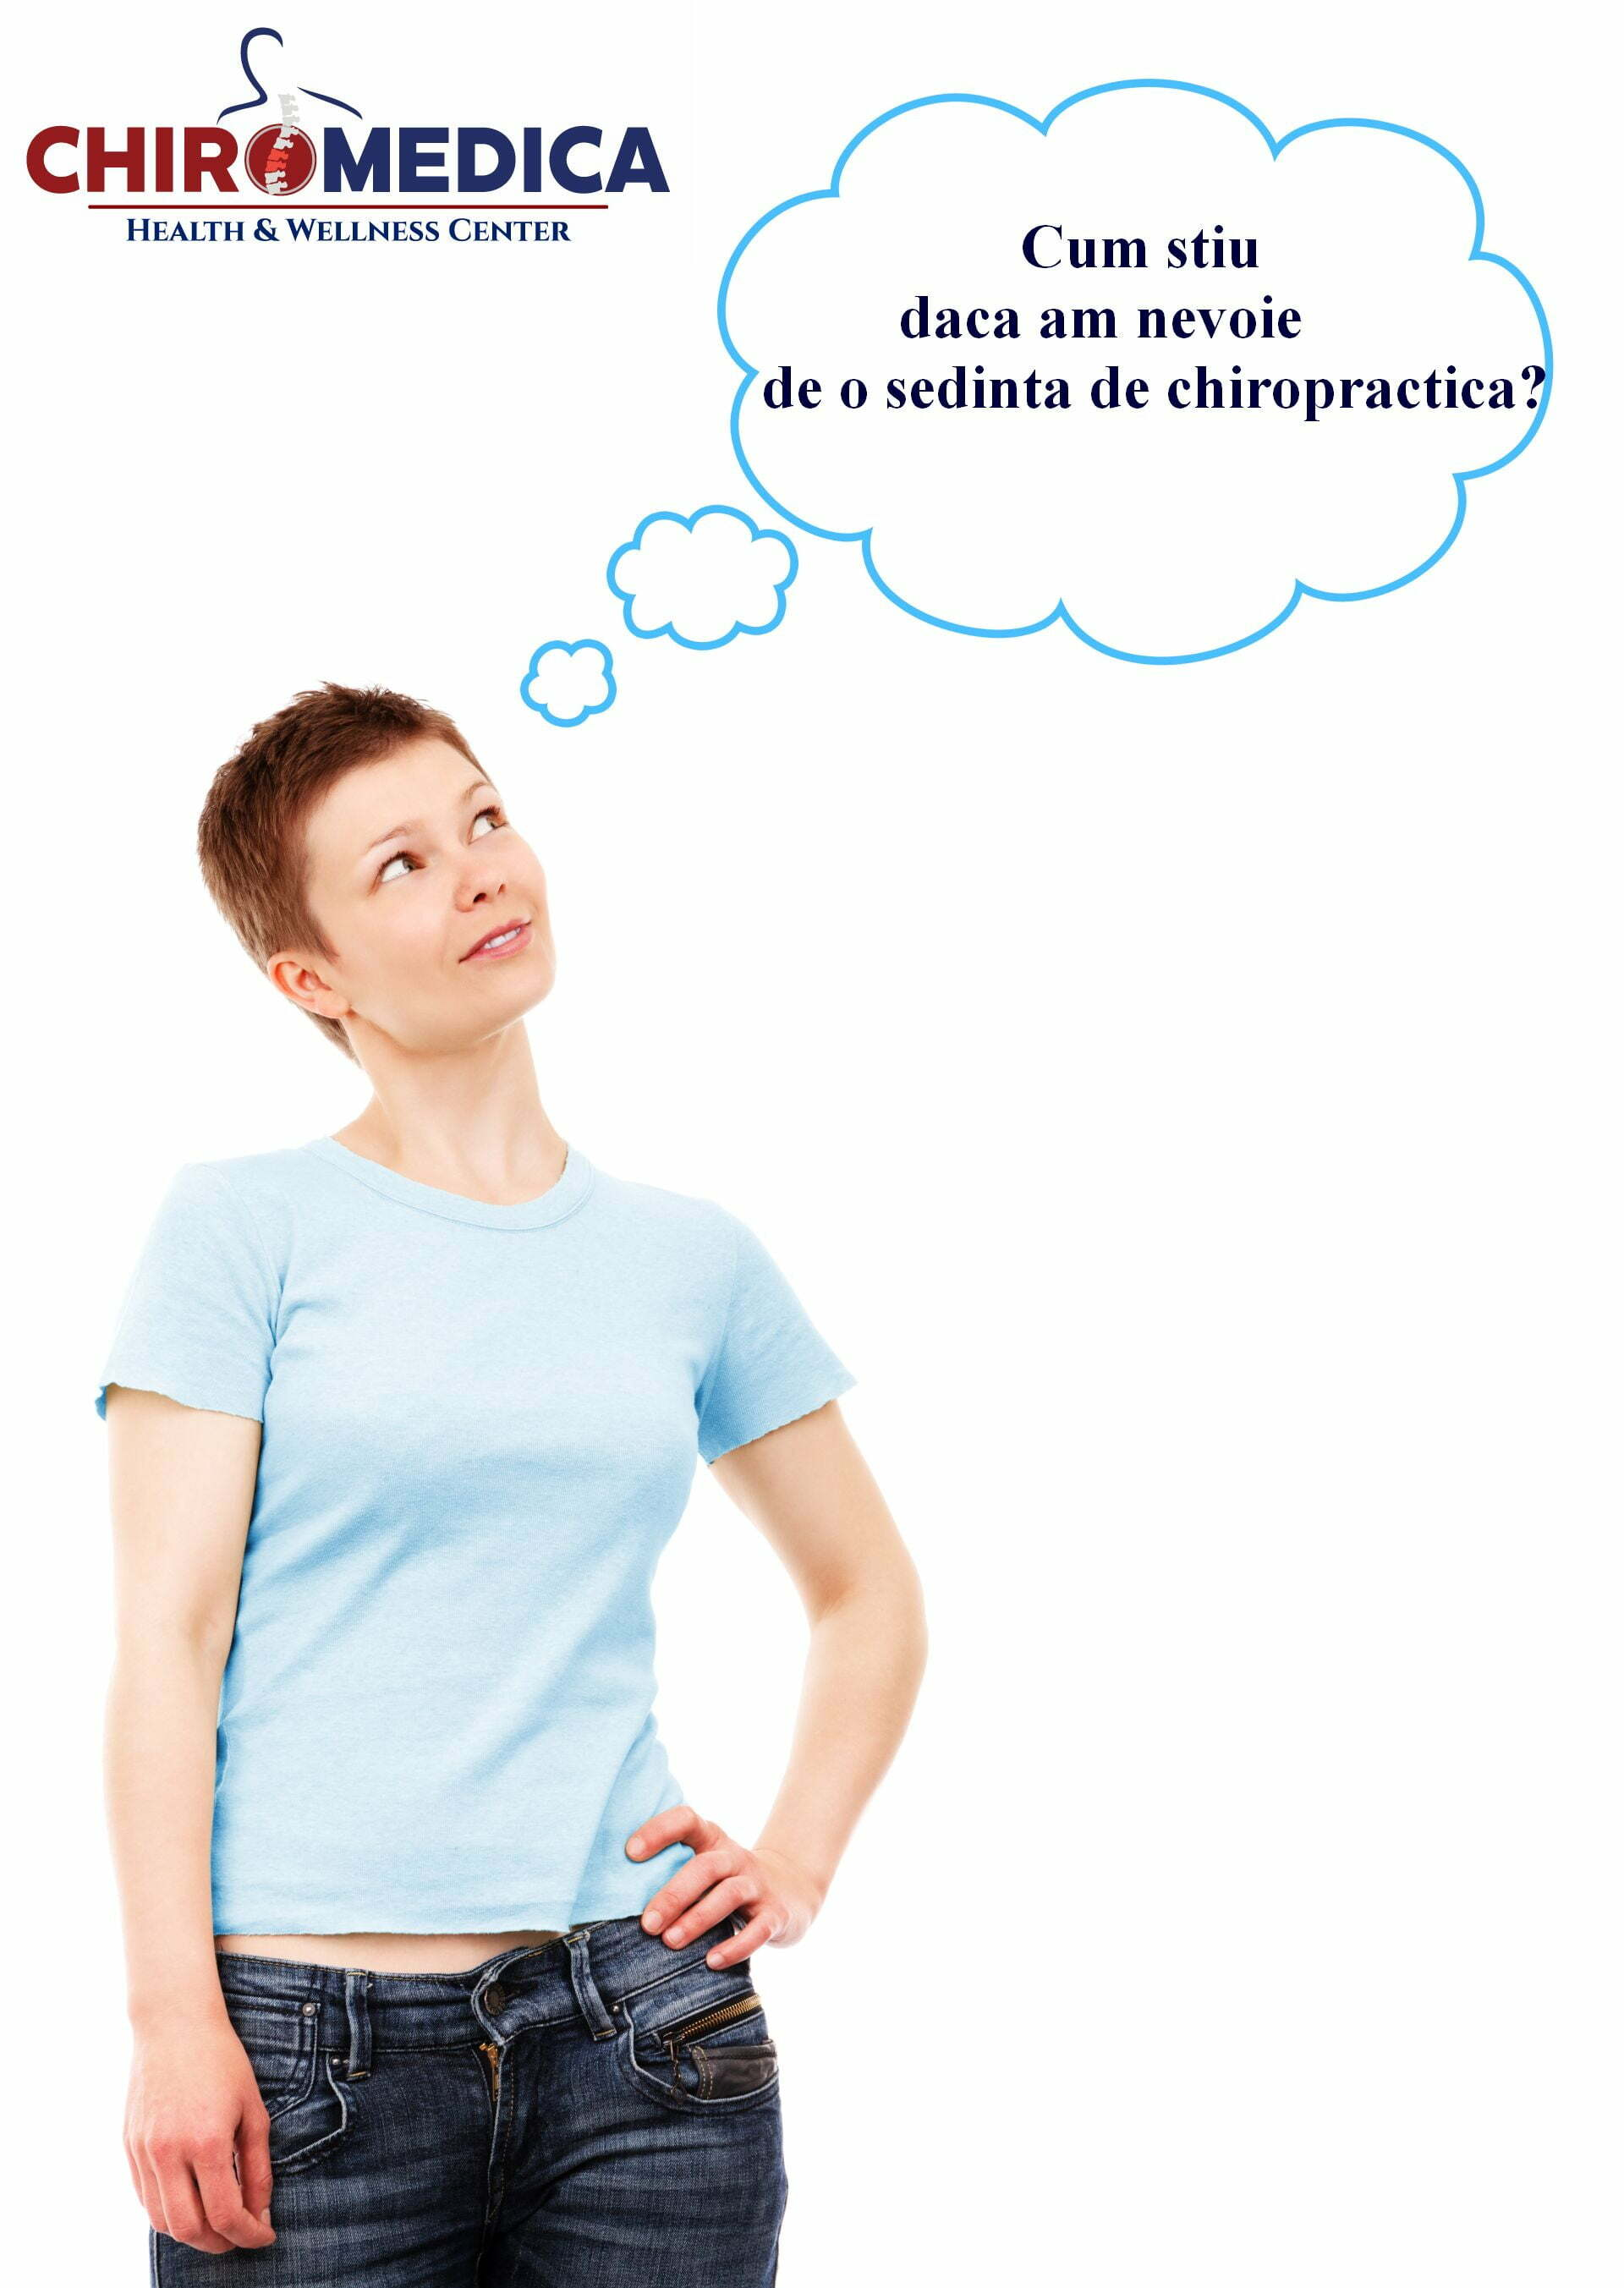 sedinta de chiropractica